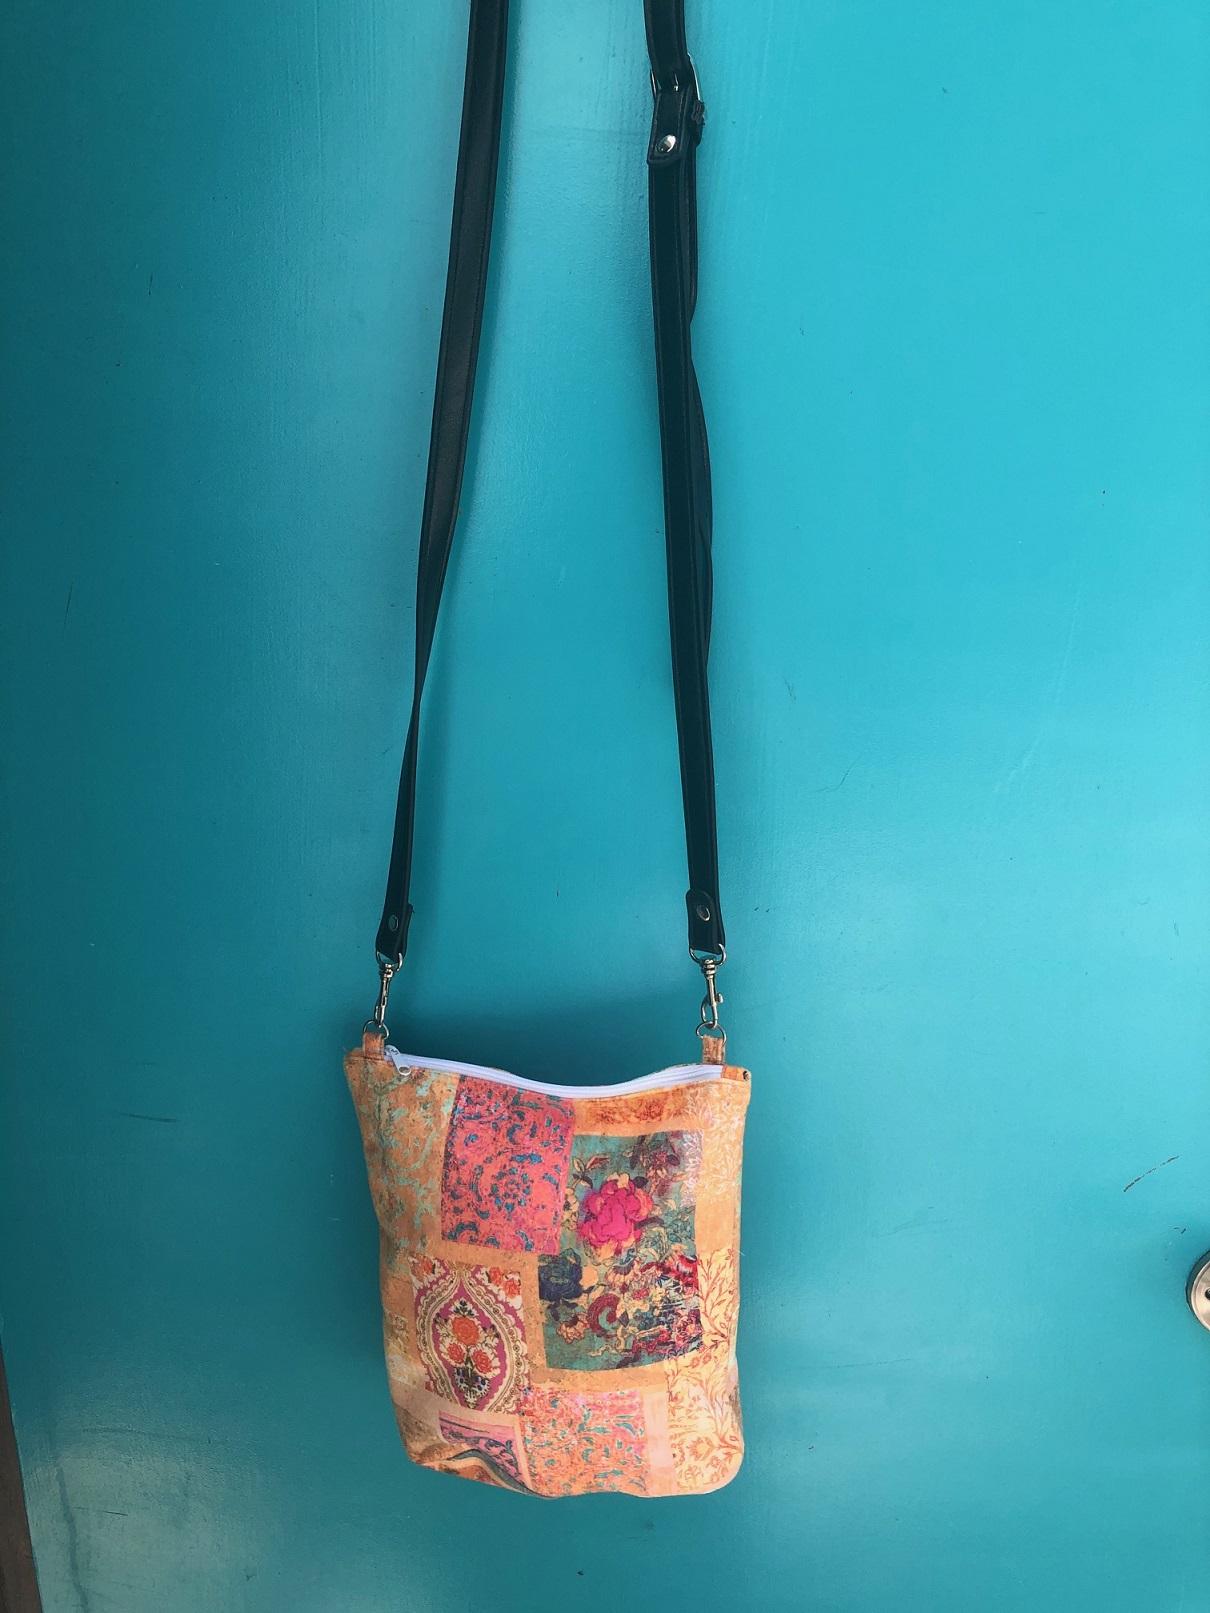 Leather Handle Velvet Bag in Venezia Gold design